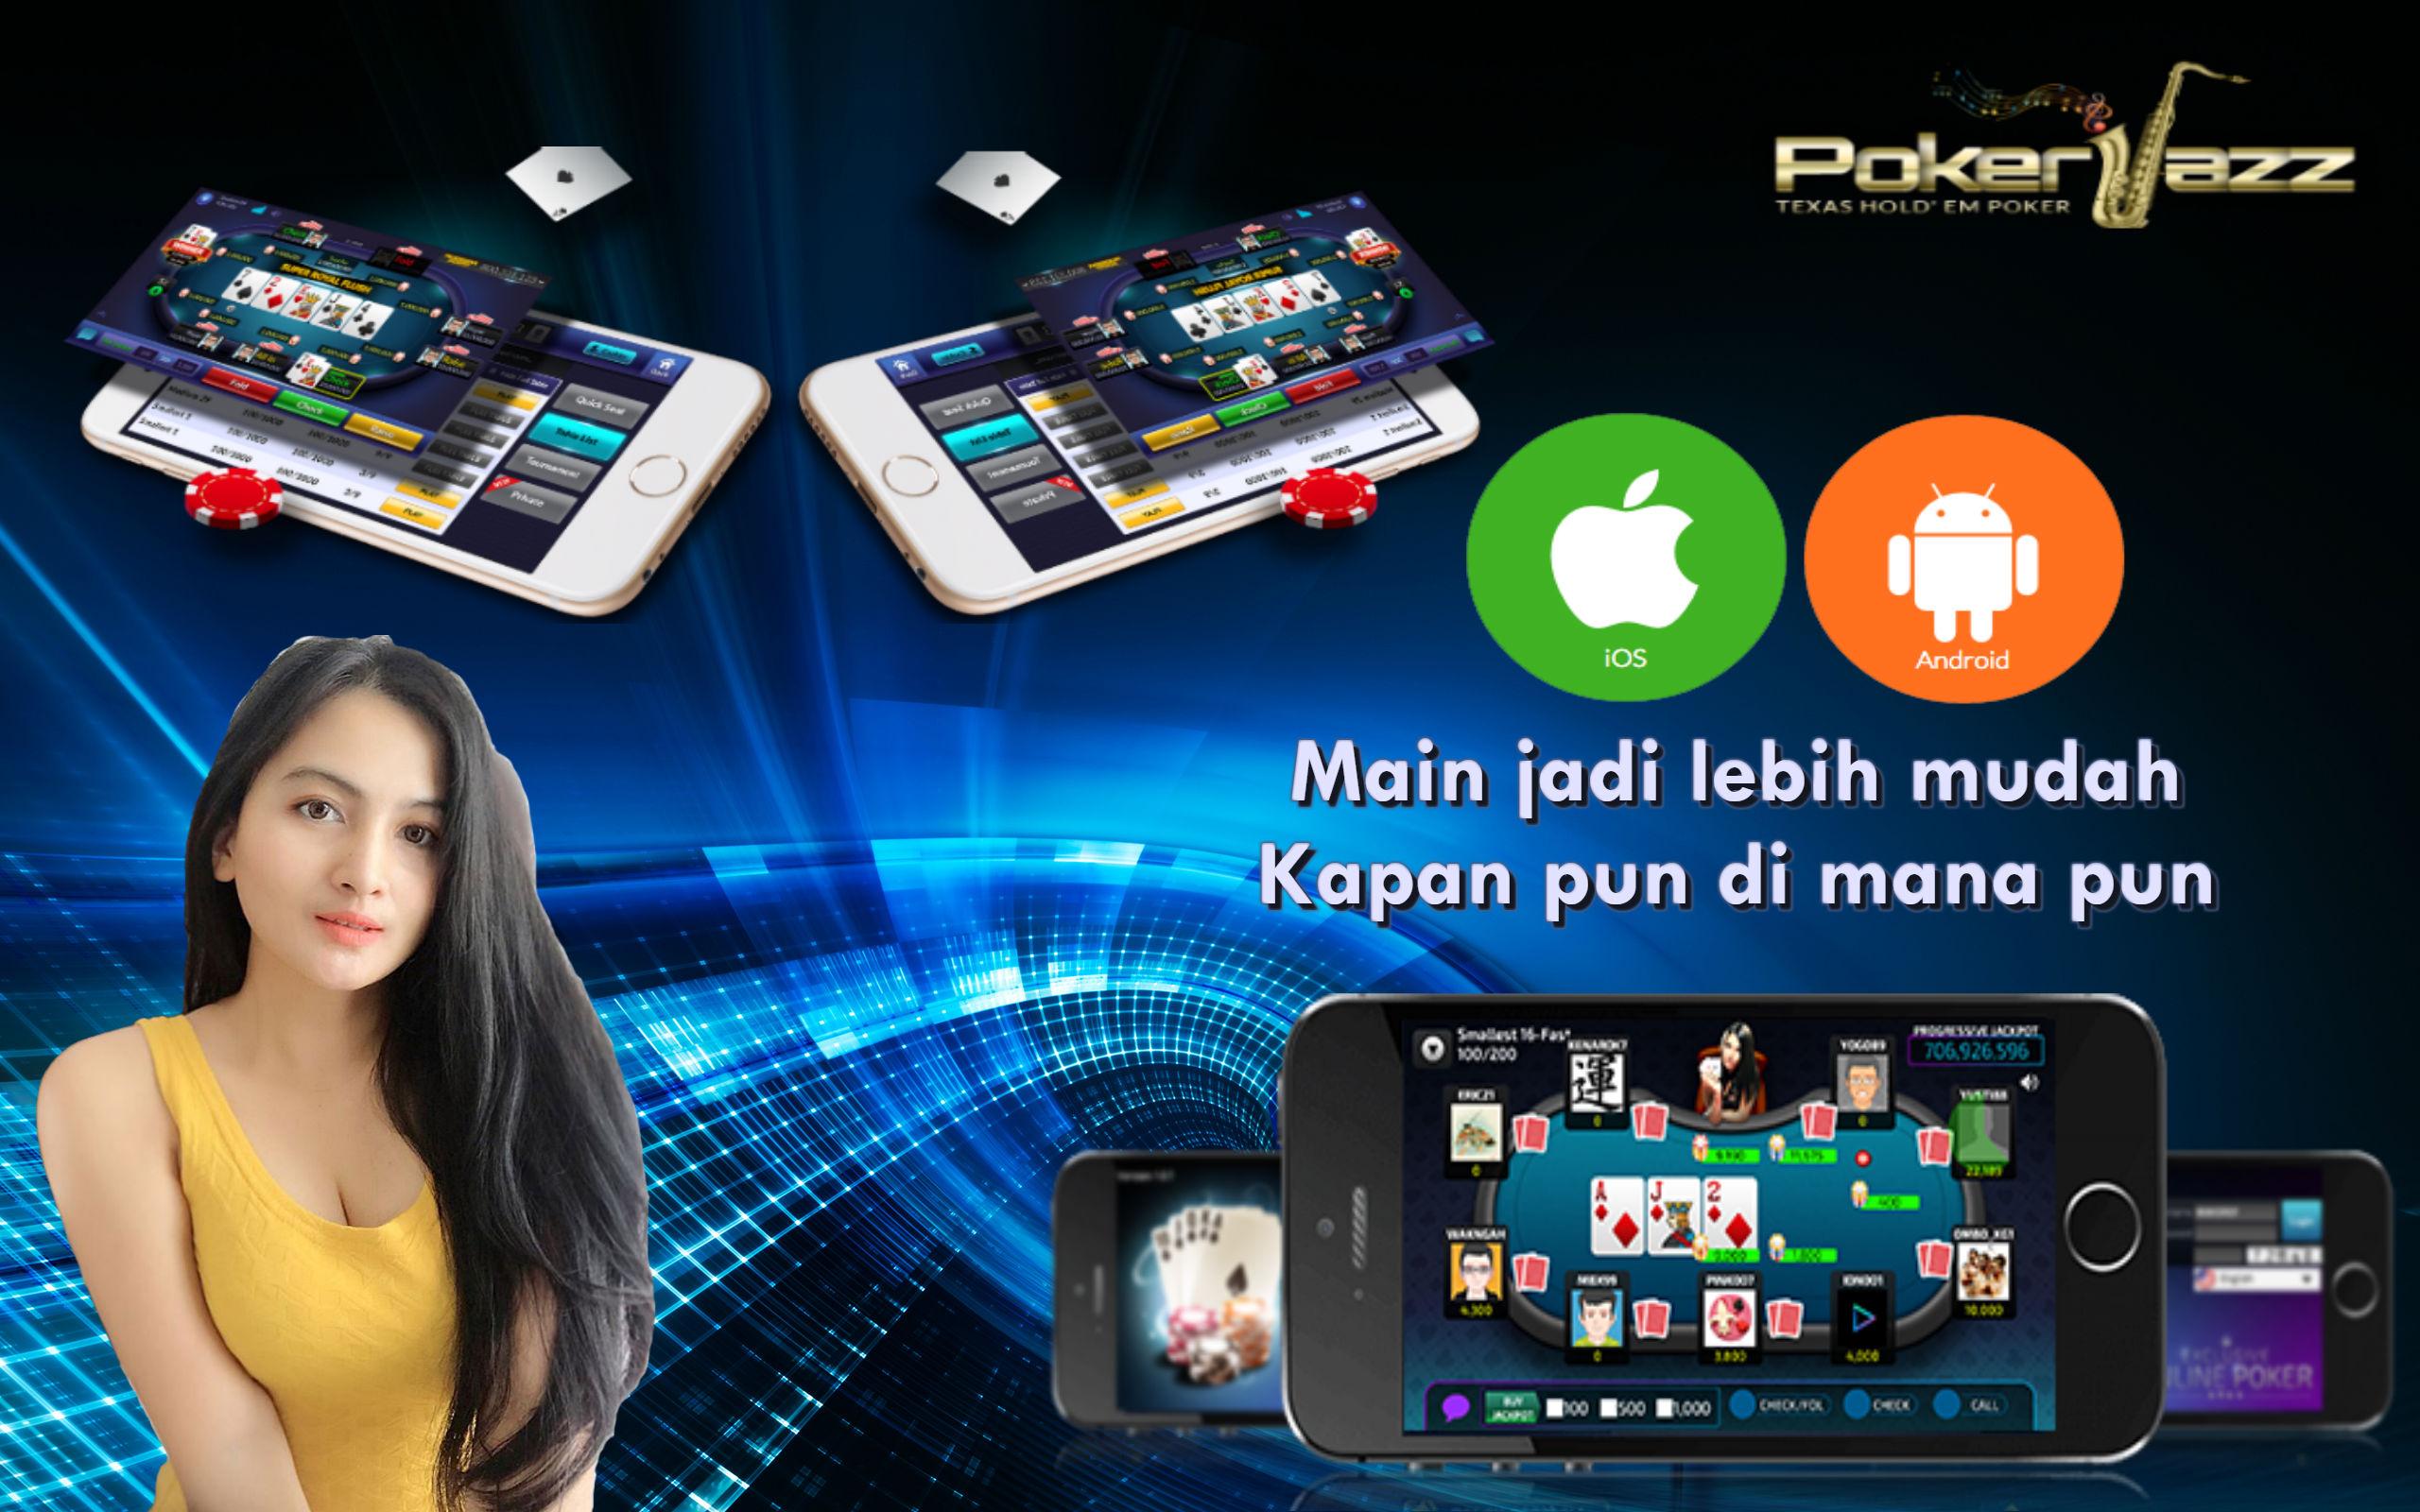 Kelebihan dan Keuntungan Bermain Poker Online Di Smartphone